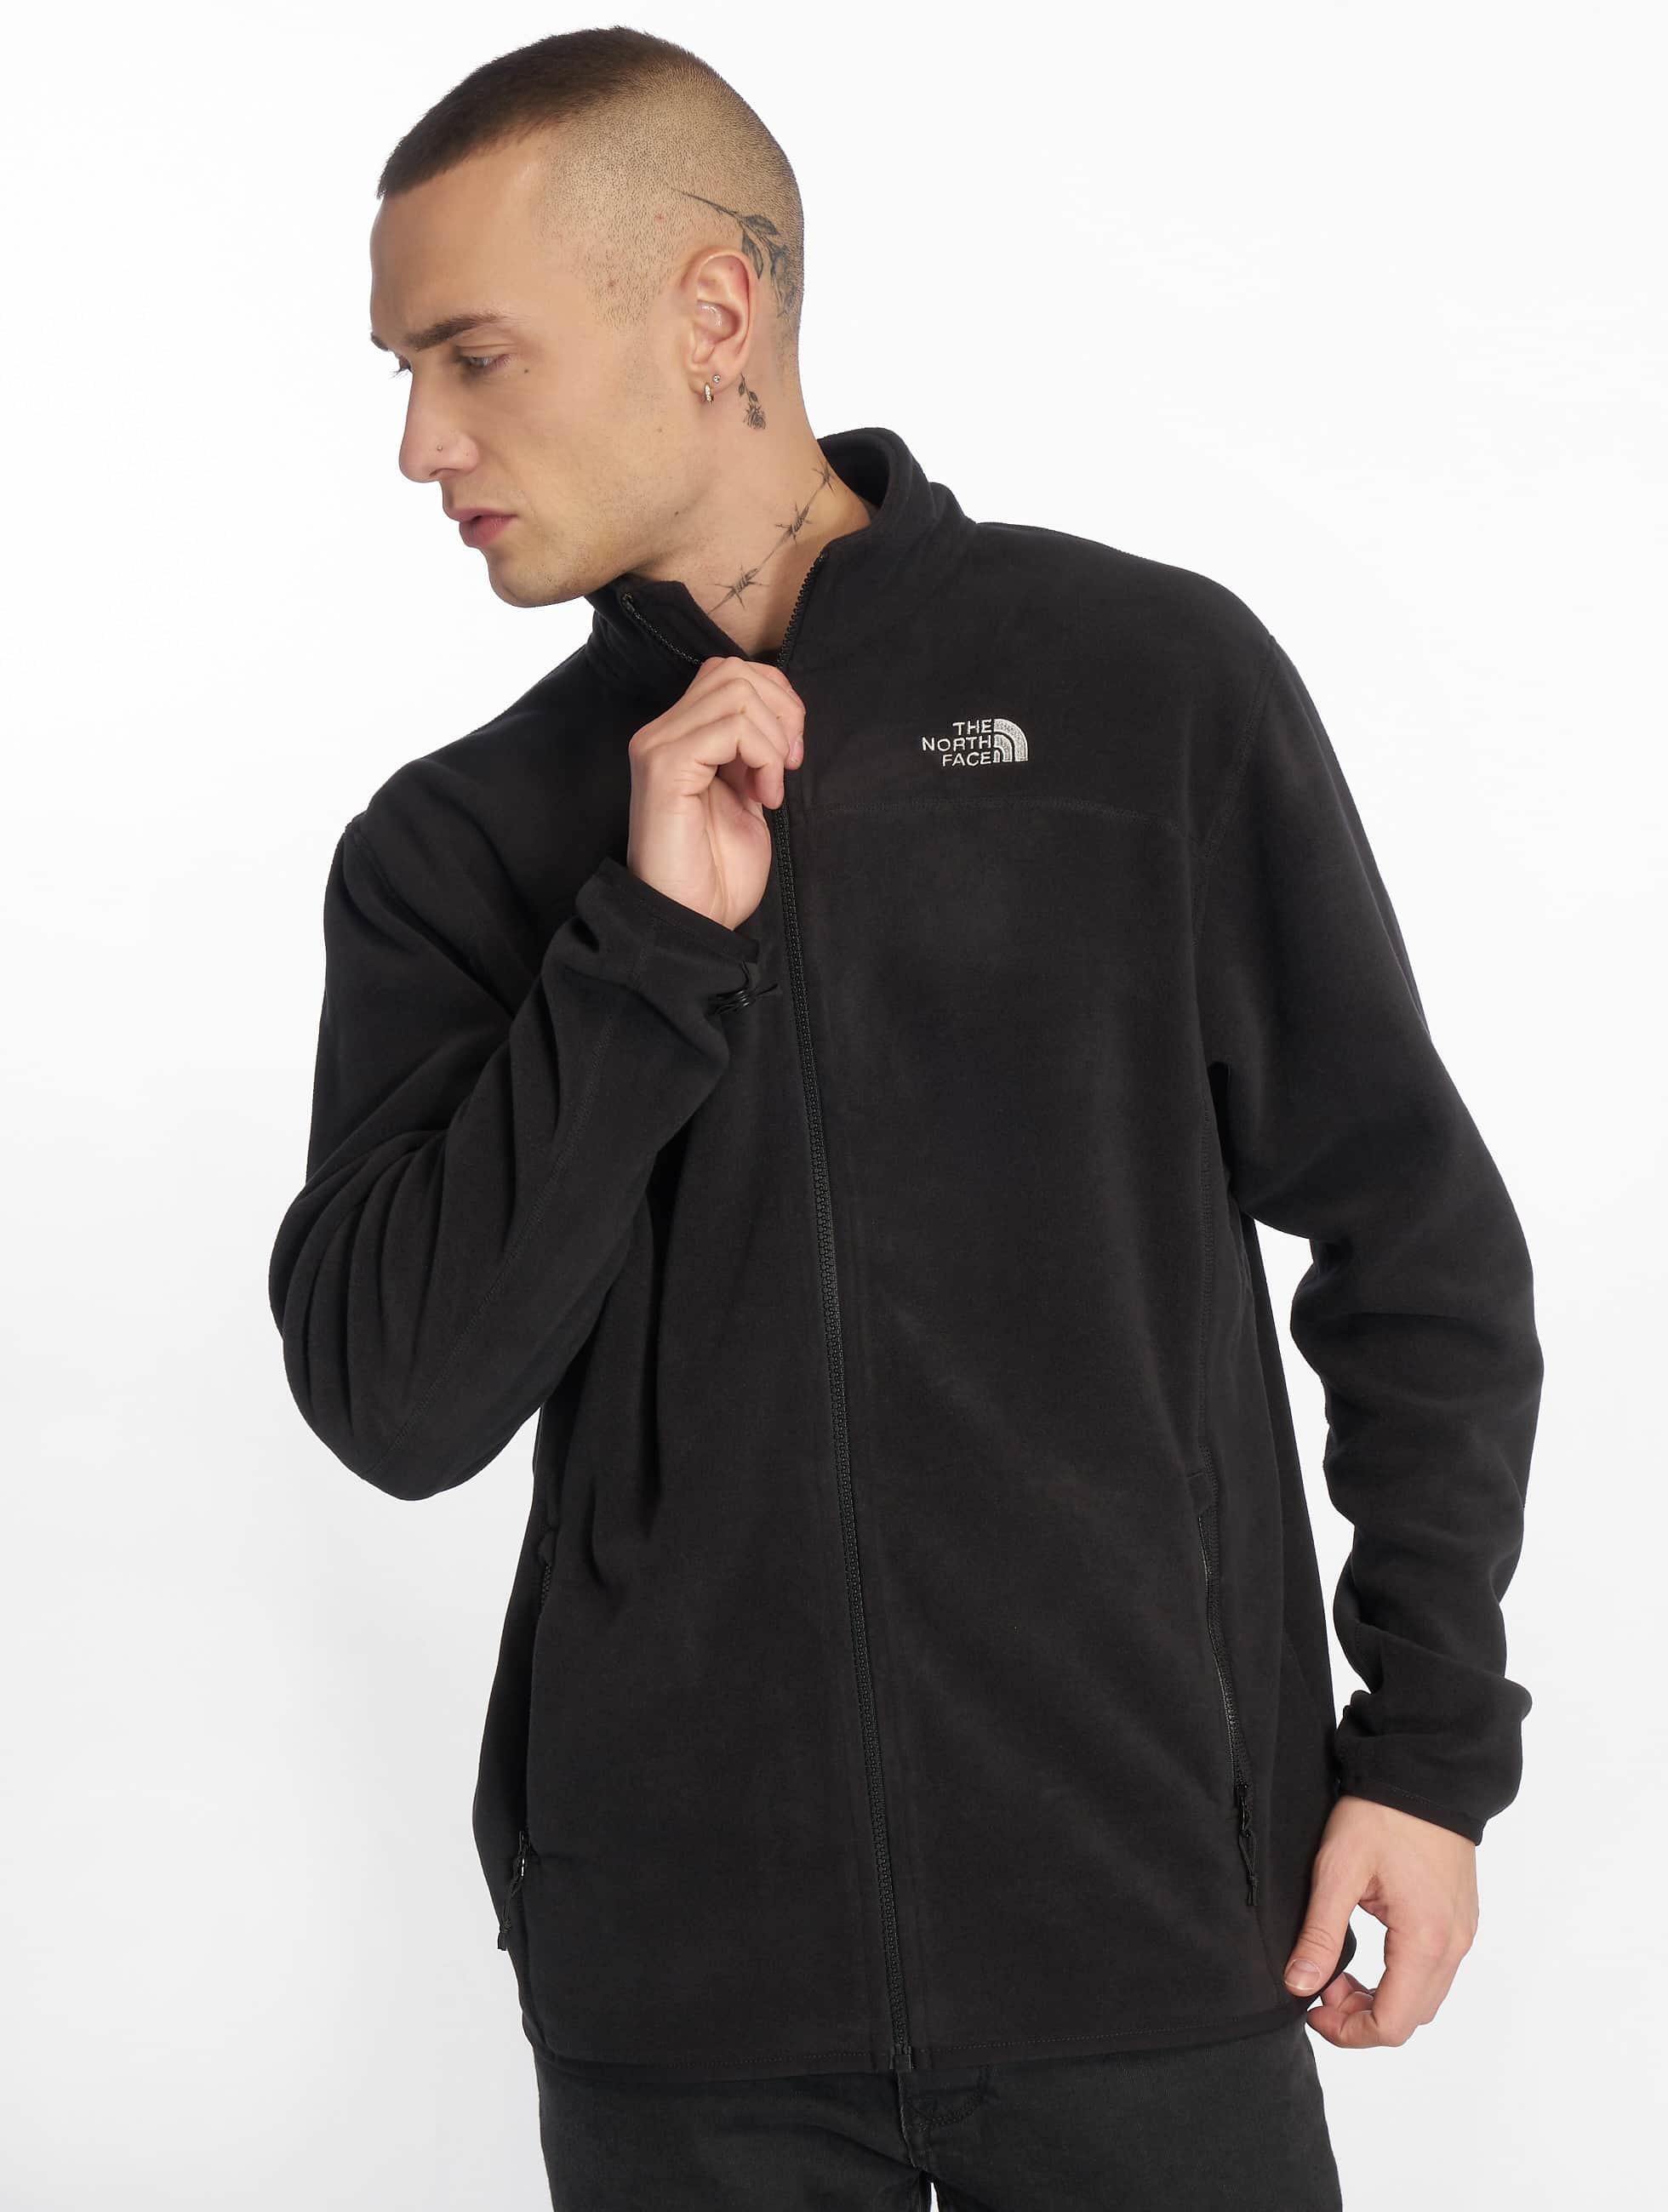 neue angebote exquisiter Stil angenehmes Gefühl The North Face M 100 Glacier Full Zip Jacket Tnf Black